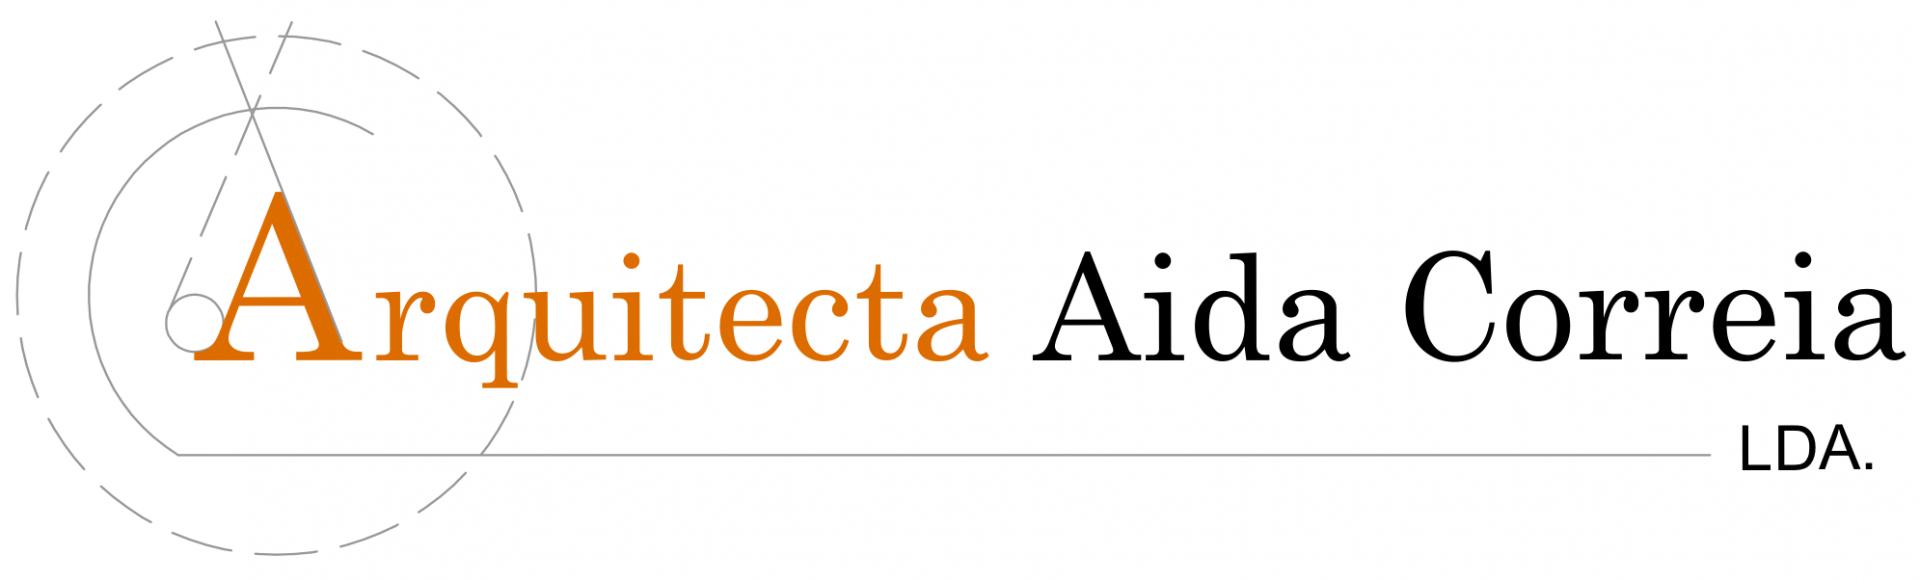 logotipo só Arquitecta Aida  autocad (1)-1 (2).png